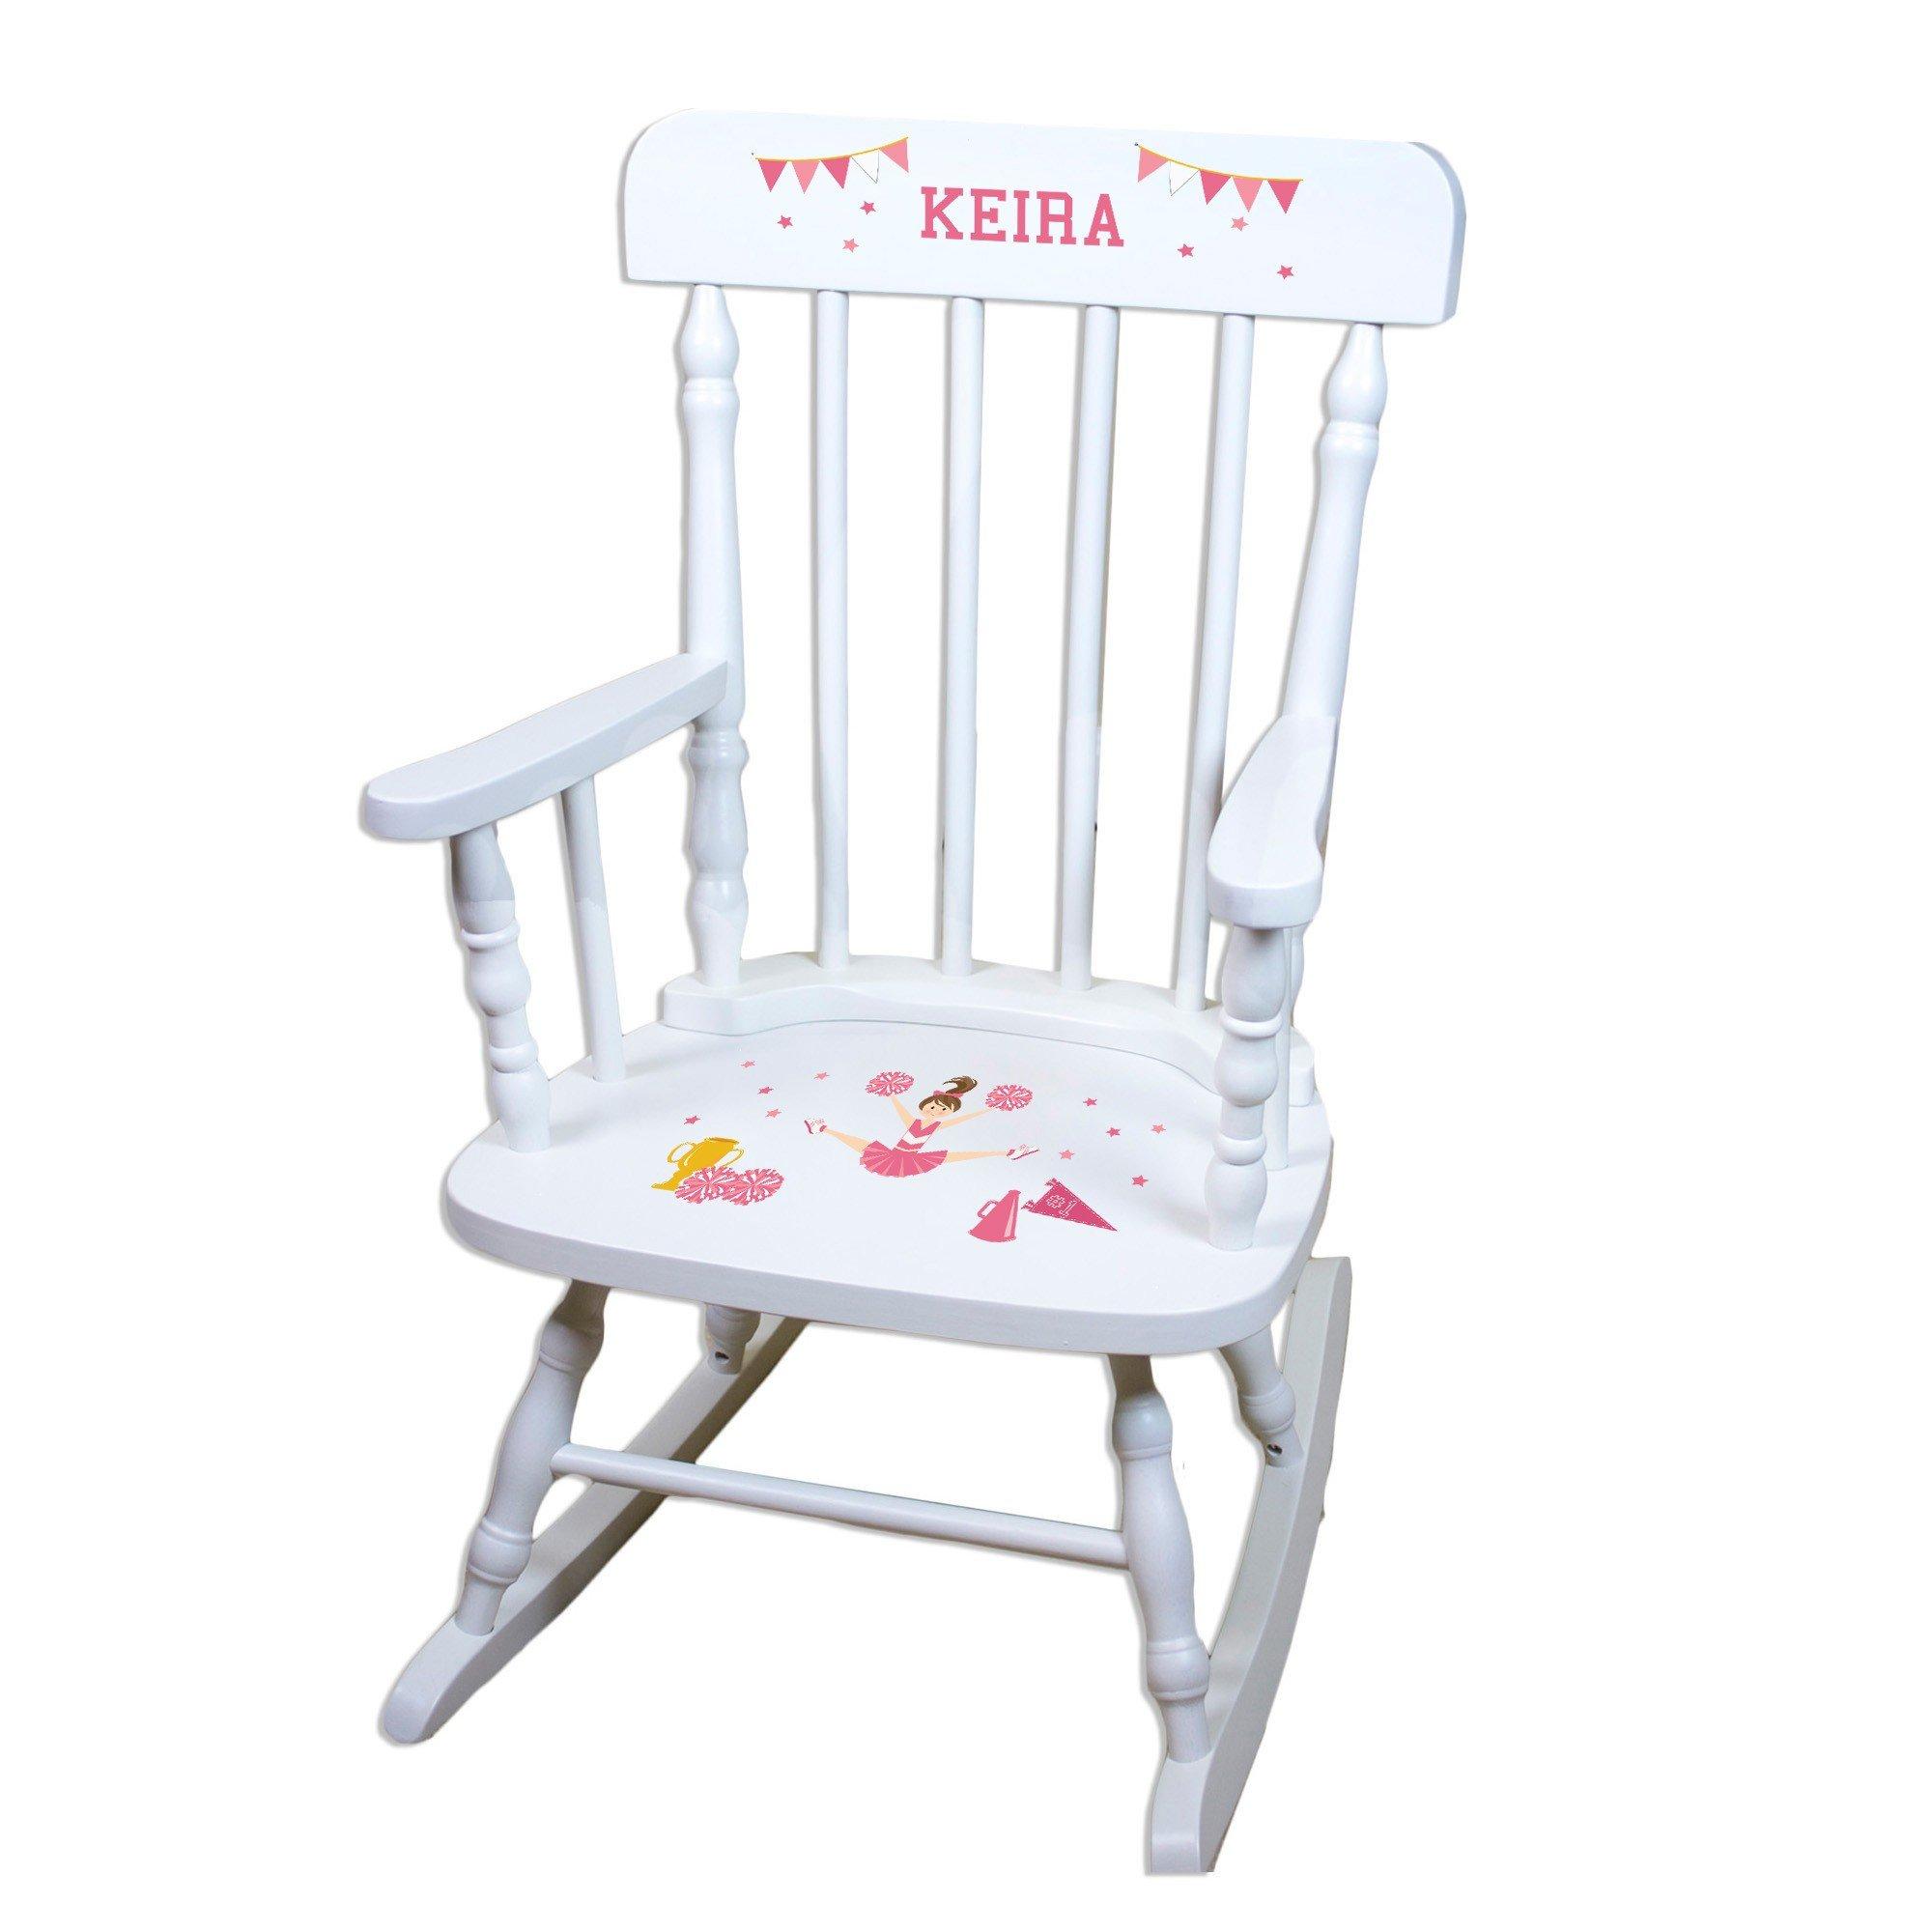 MyBambino Personalized Cheerleader Brunette Pink White Wooden Childrens Rocking Chair